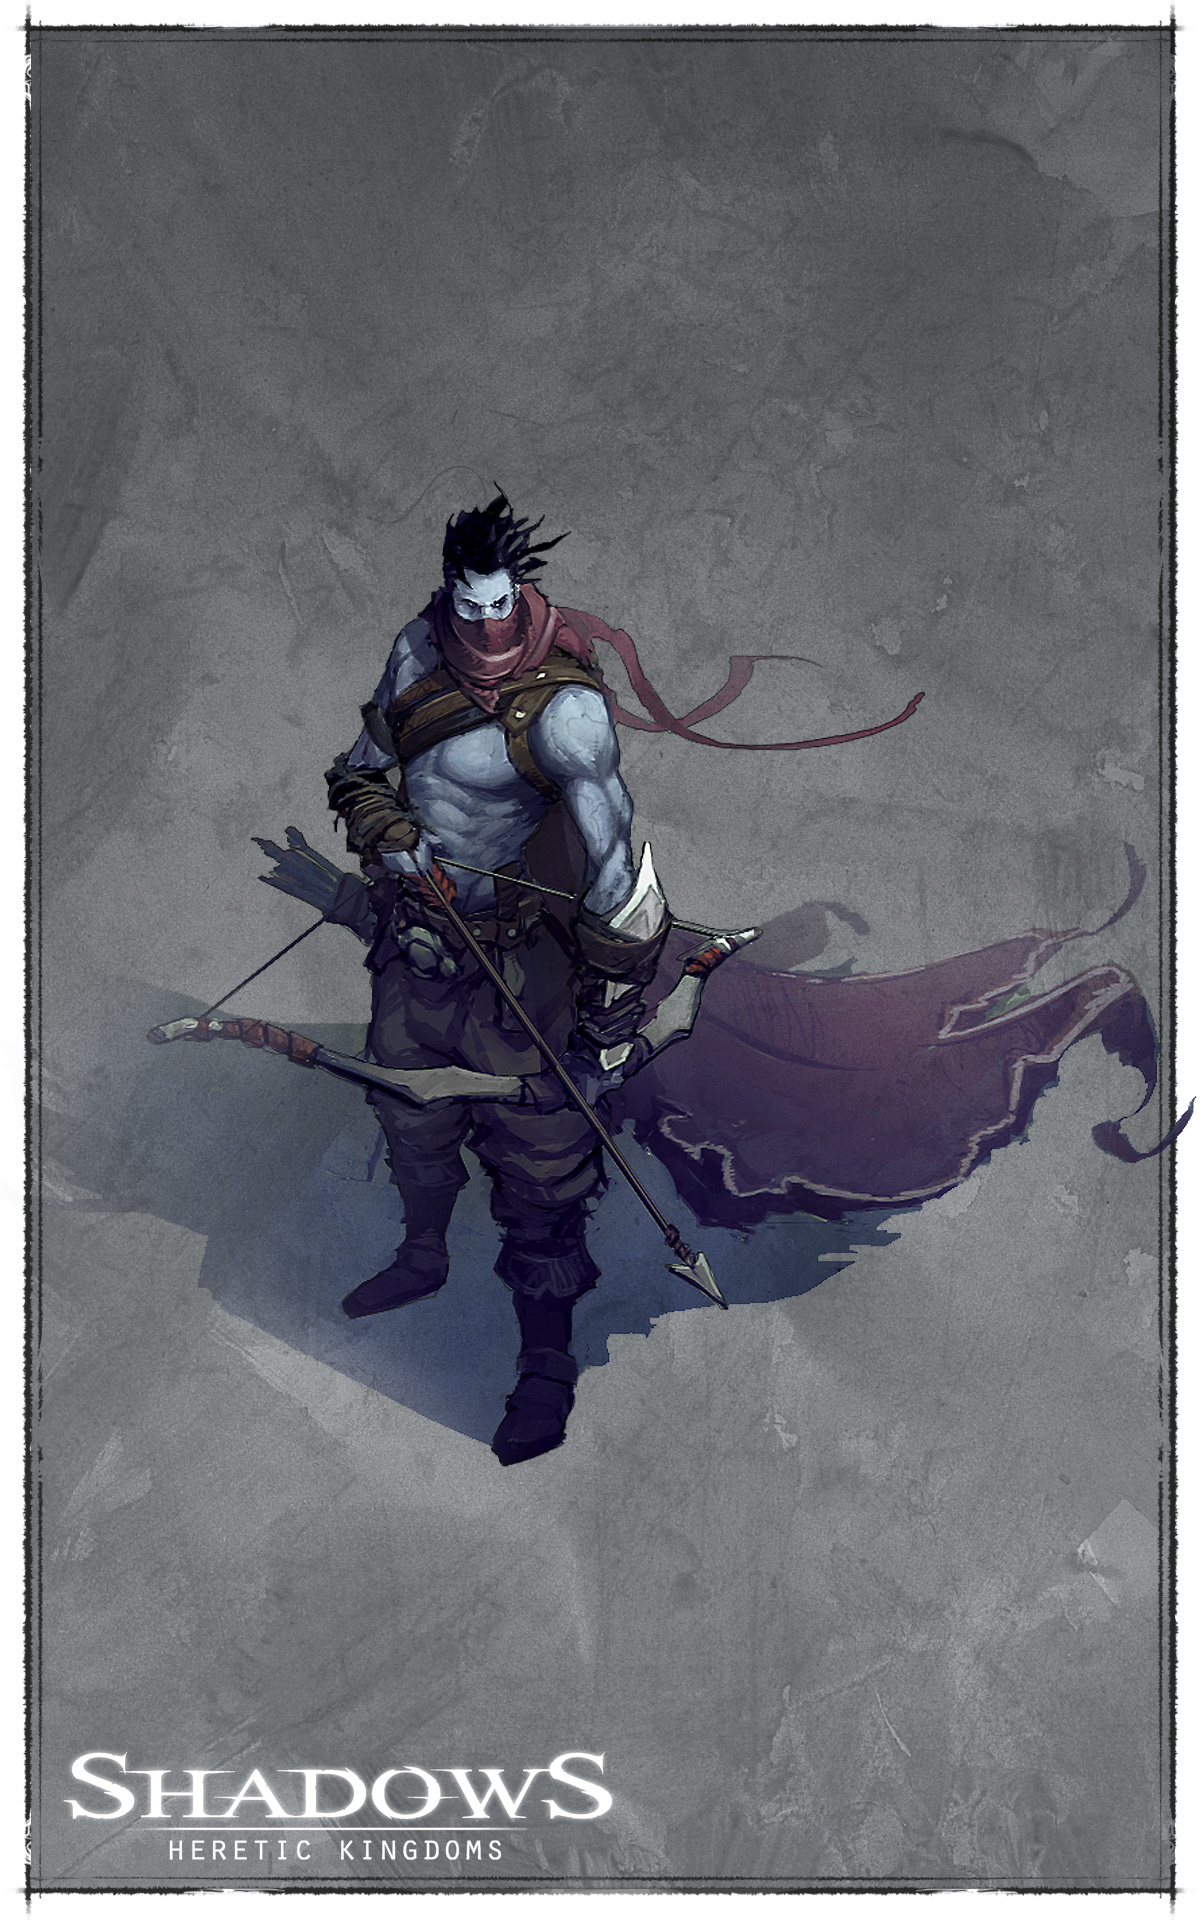 Арт к игре Shadows: Heretic Kingdoms